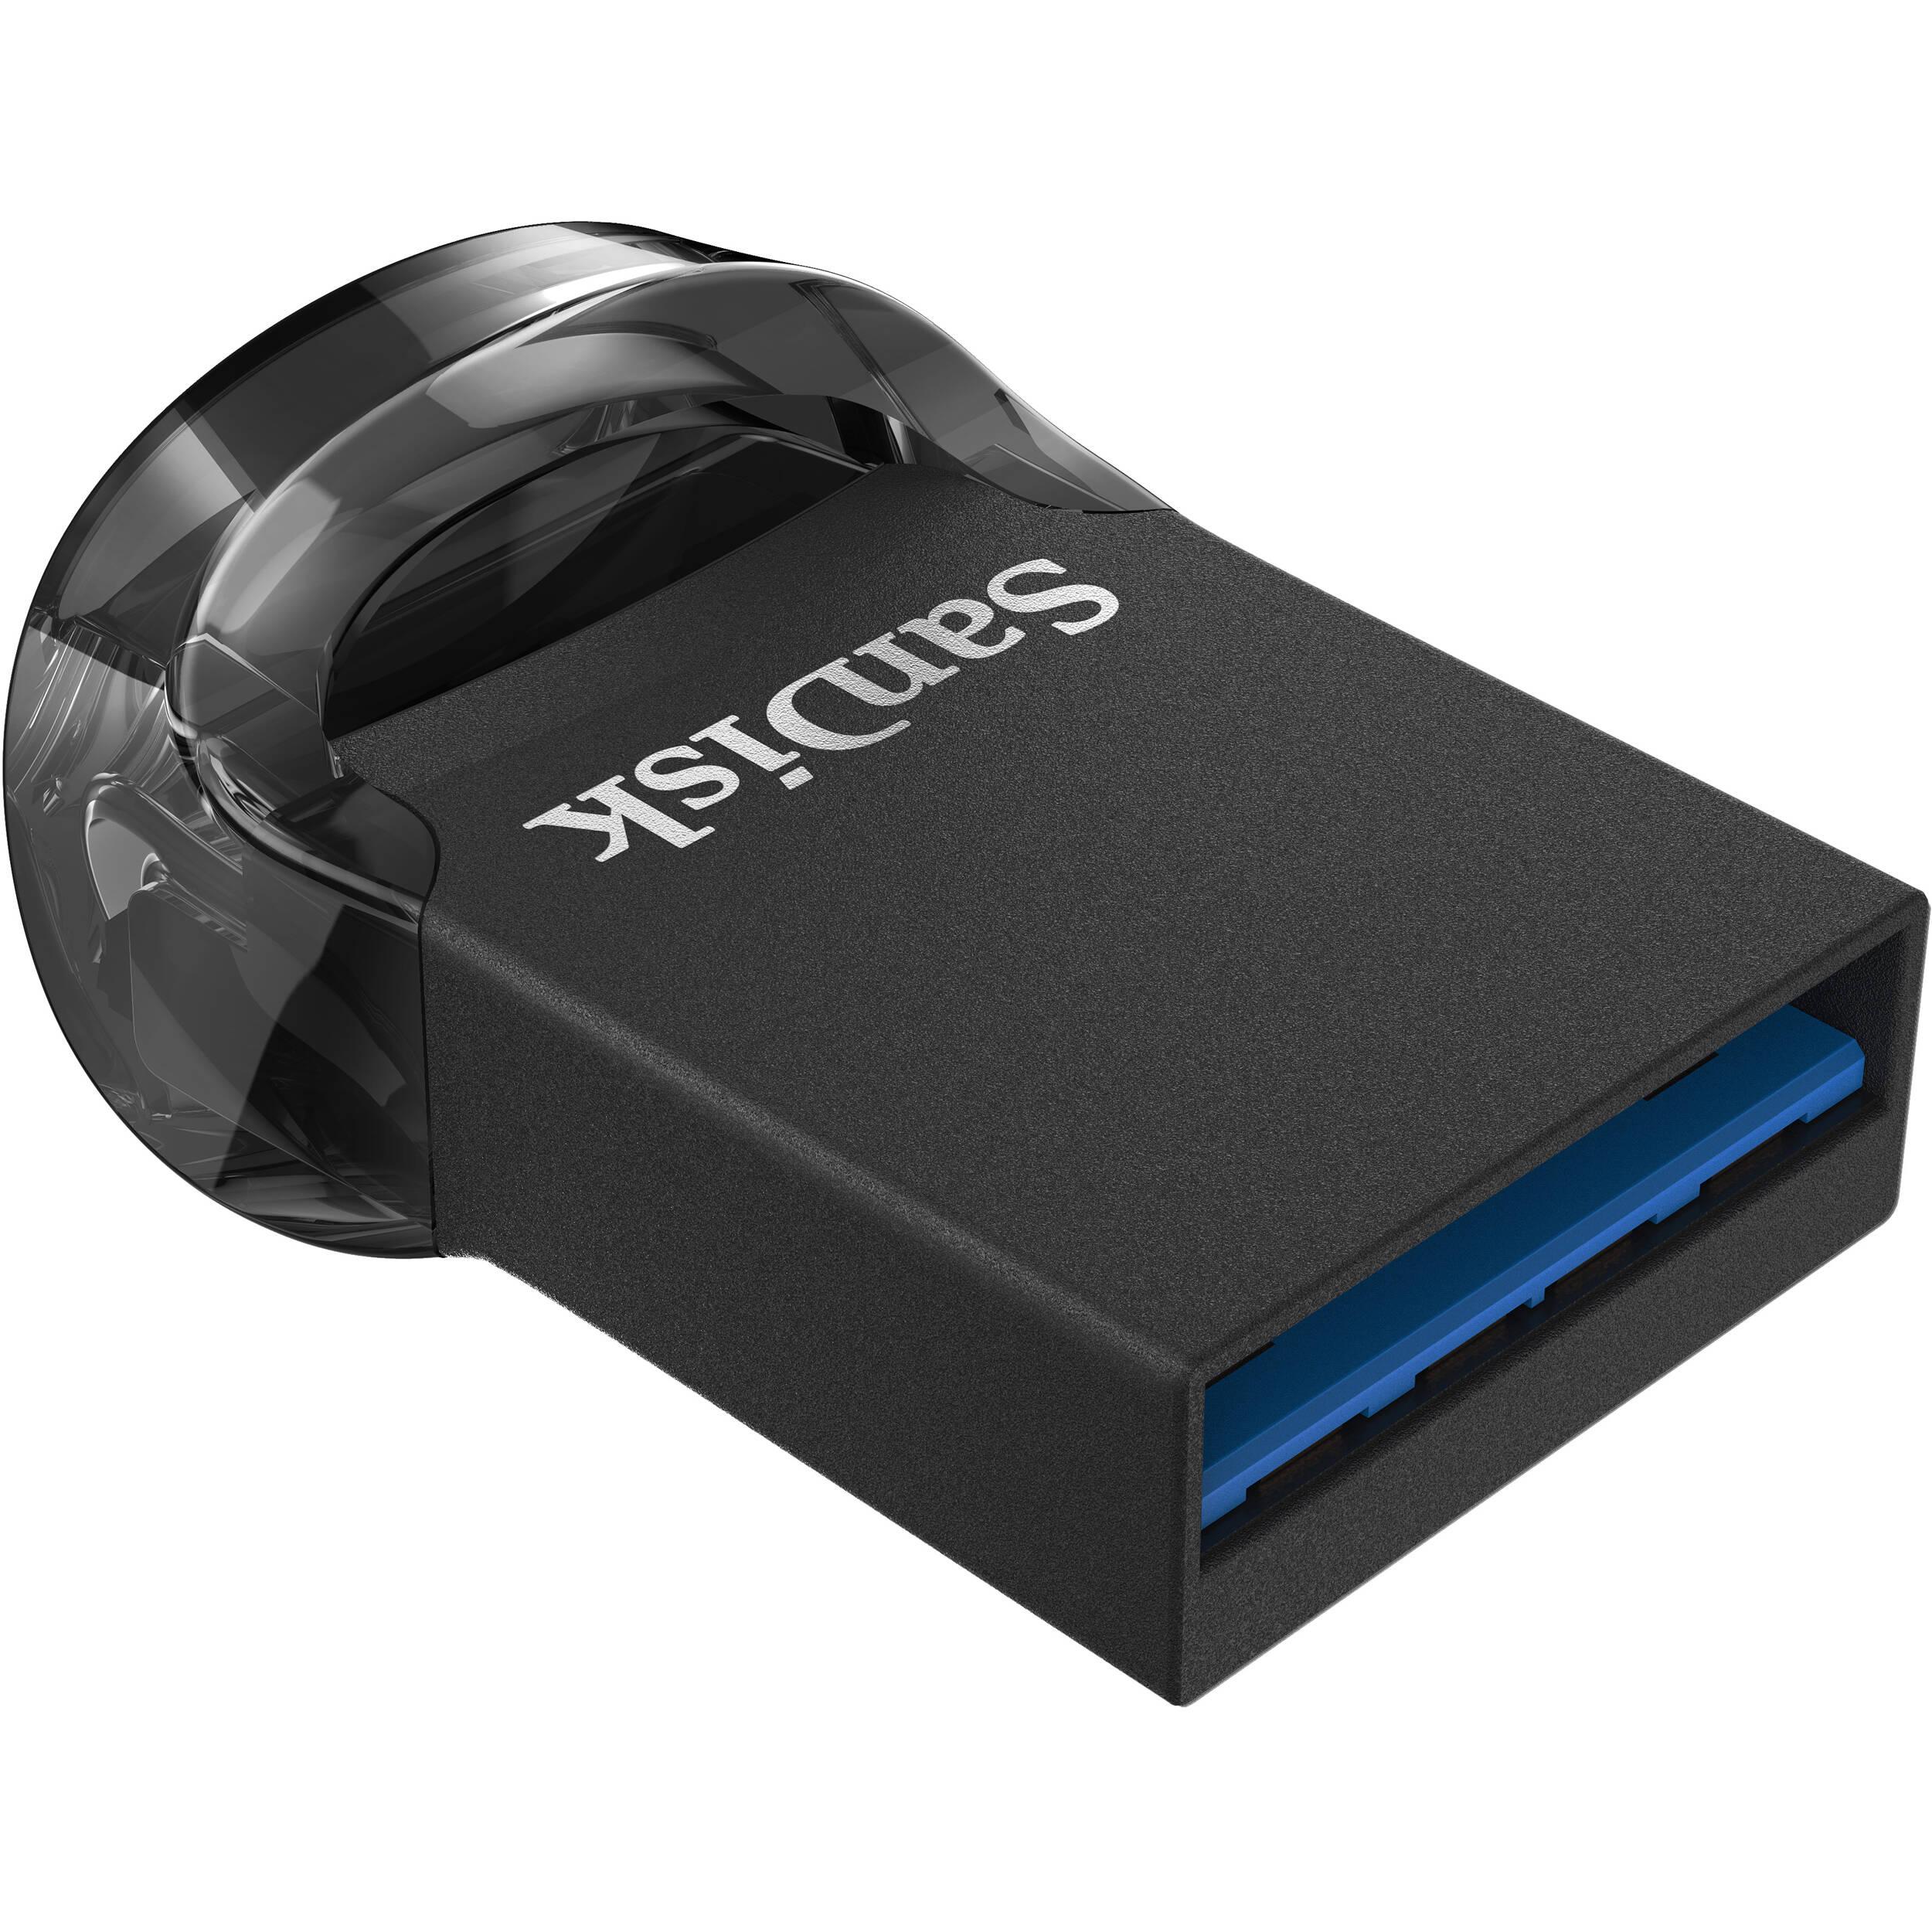 Flash Drives And Usb Bh Photo Sandisk Ixpand Flashdisk Lightning 30 128gb Sdix30c 128g 256gb Ultra Fit 31 Type A Drive